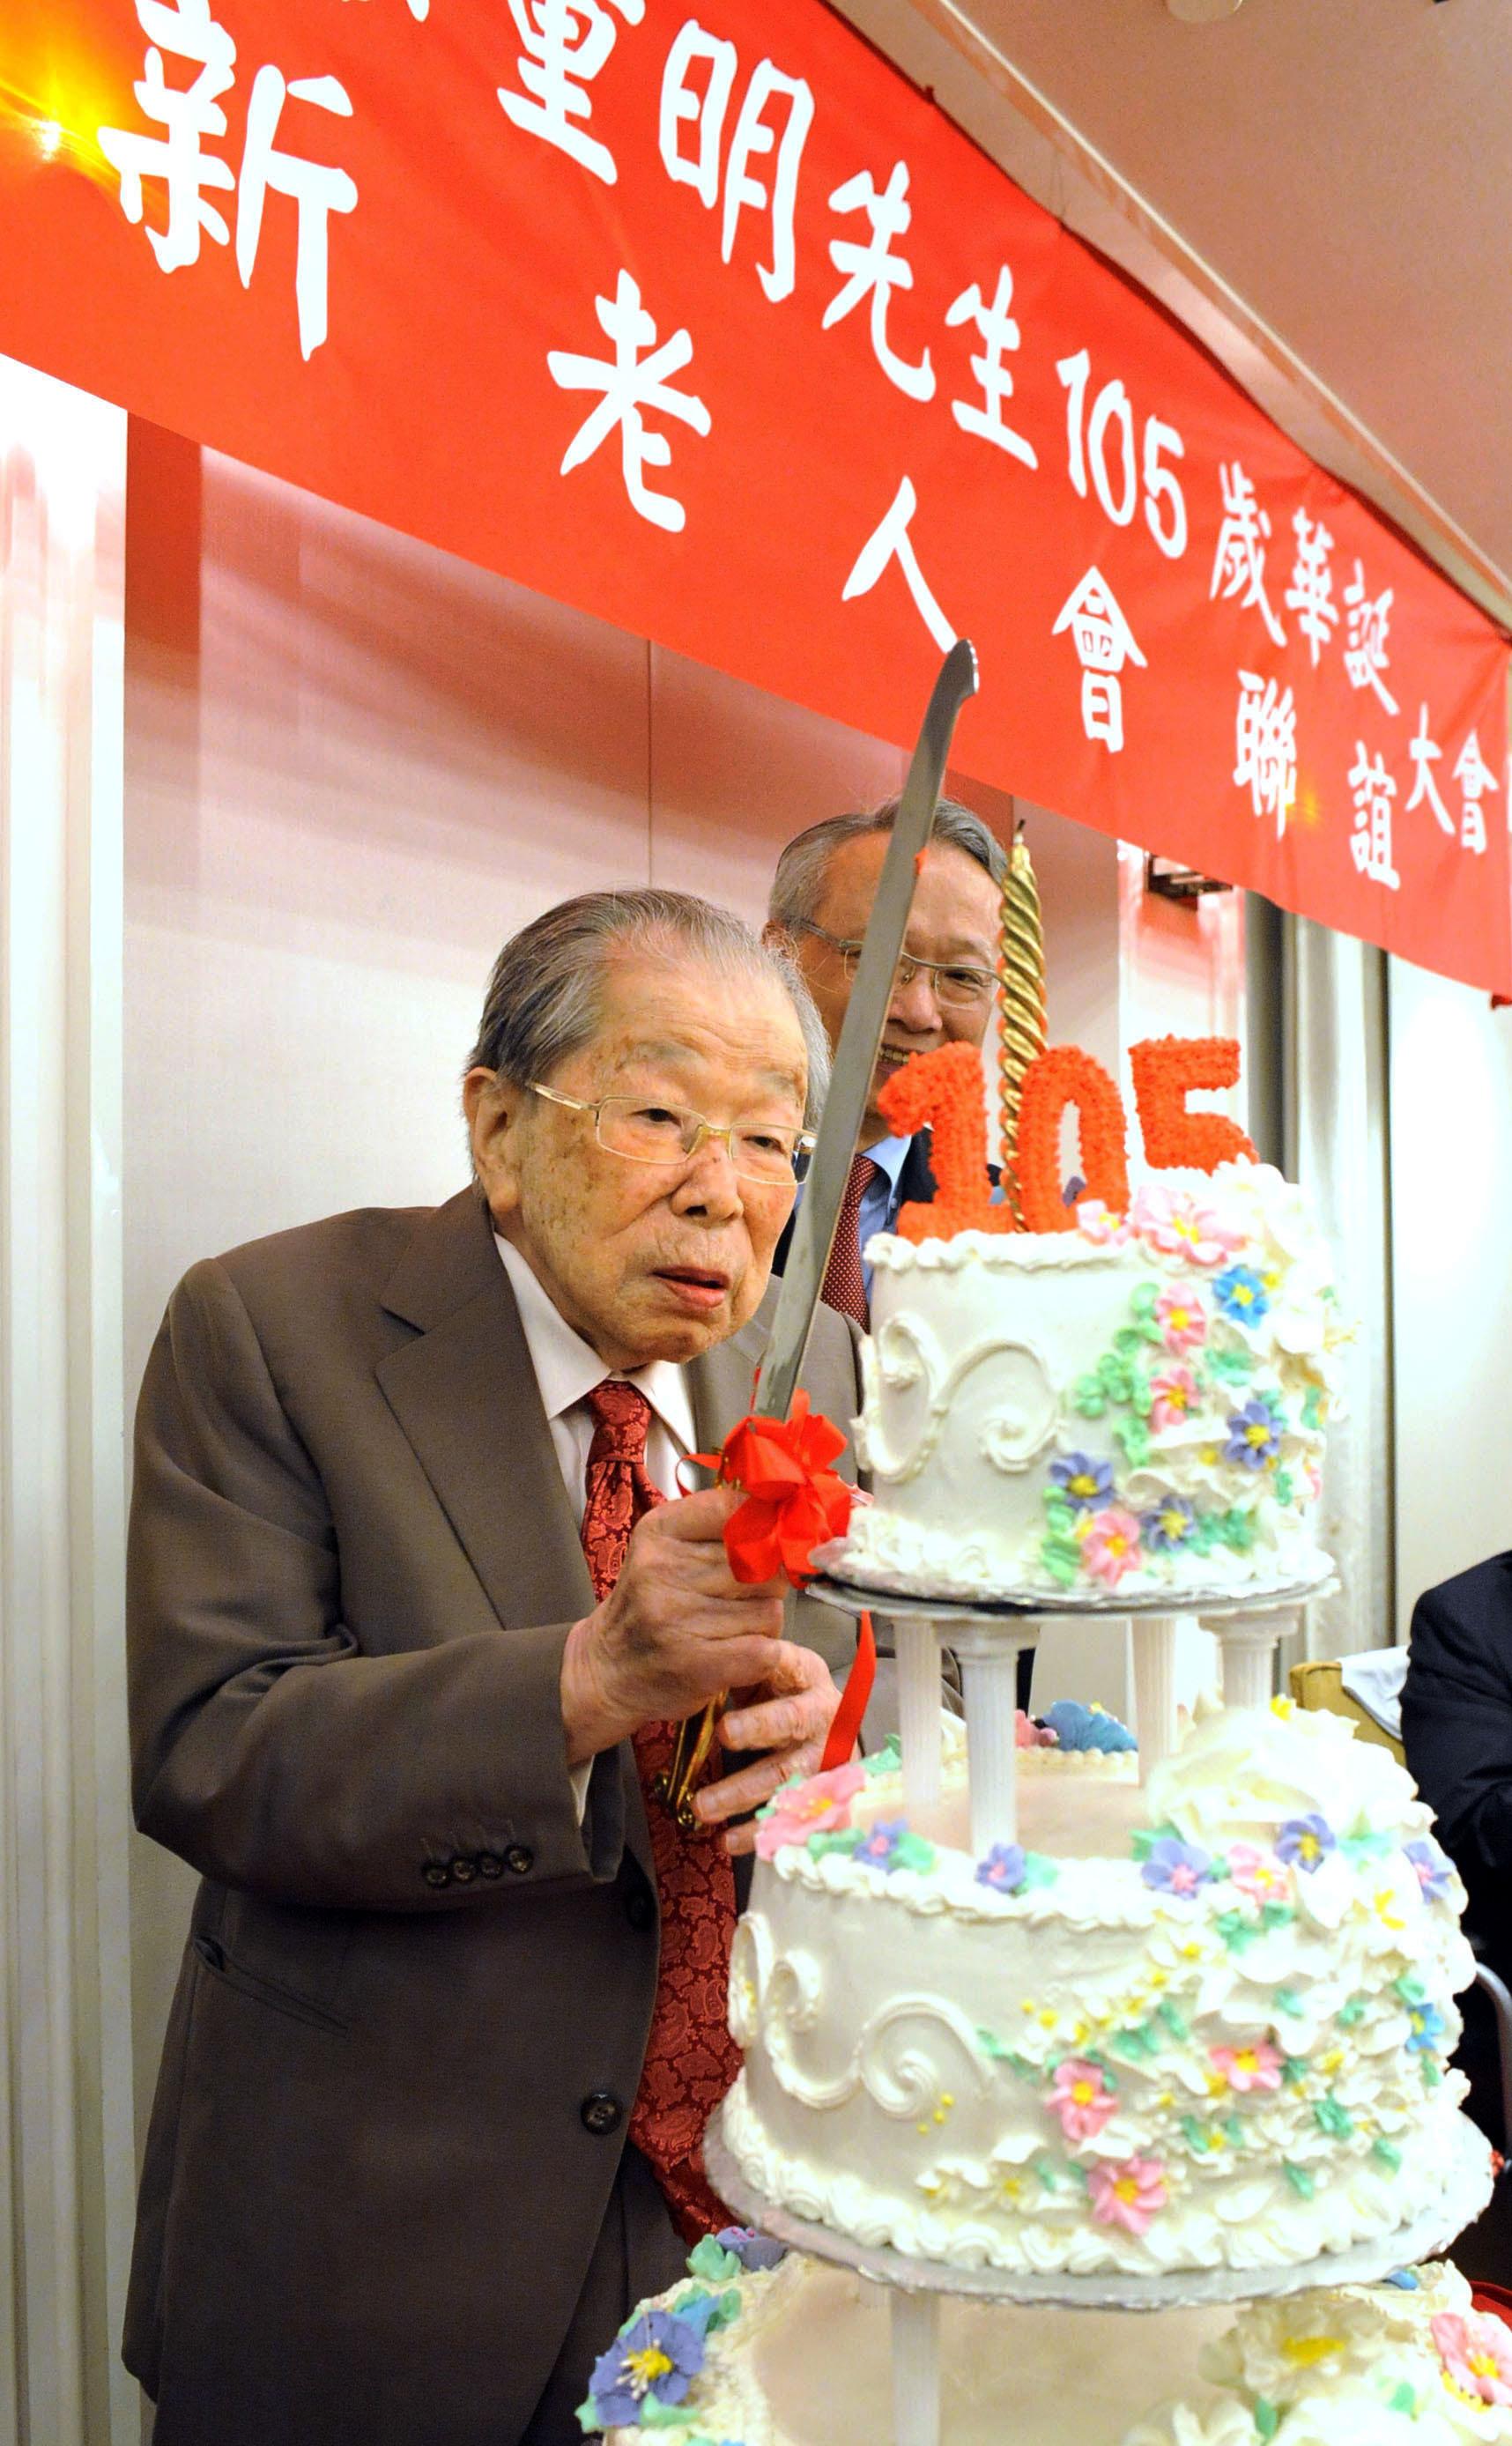 Shigeaki Hinohara, Japan's centenarian doctor, dies at 105